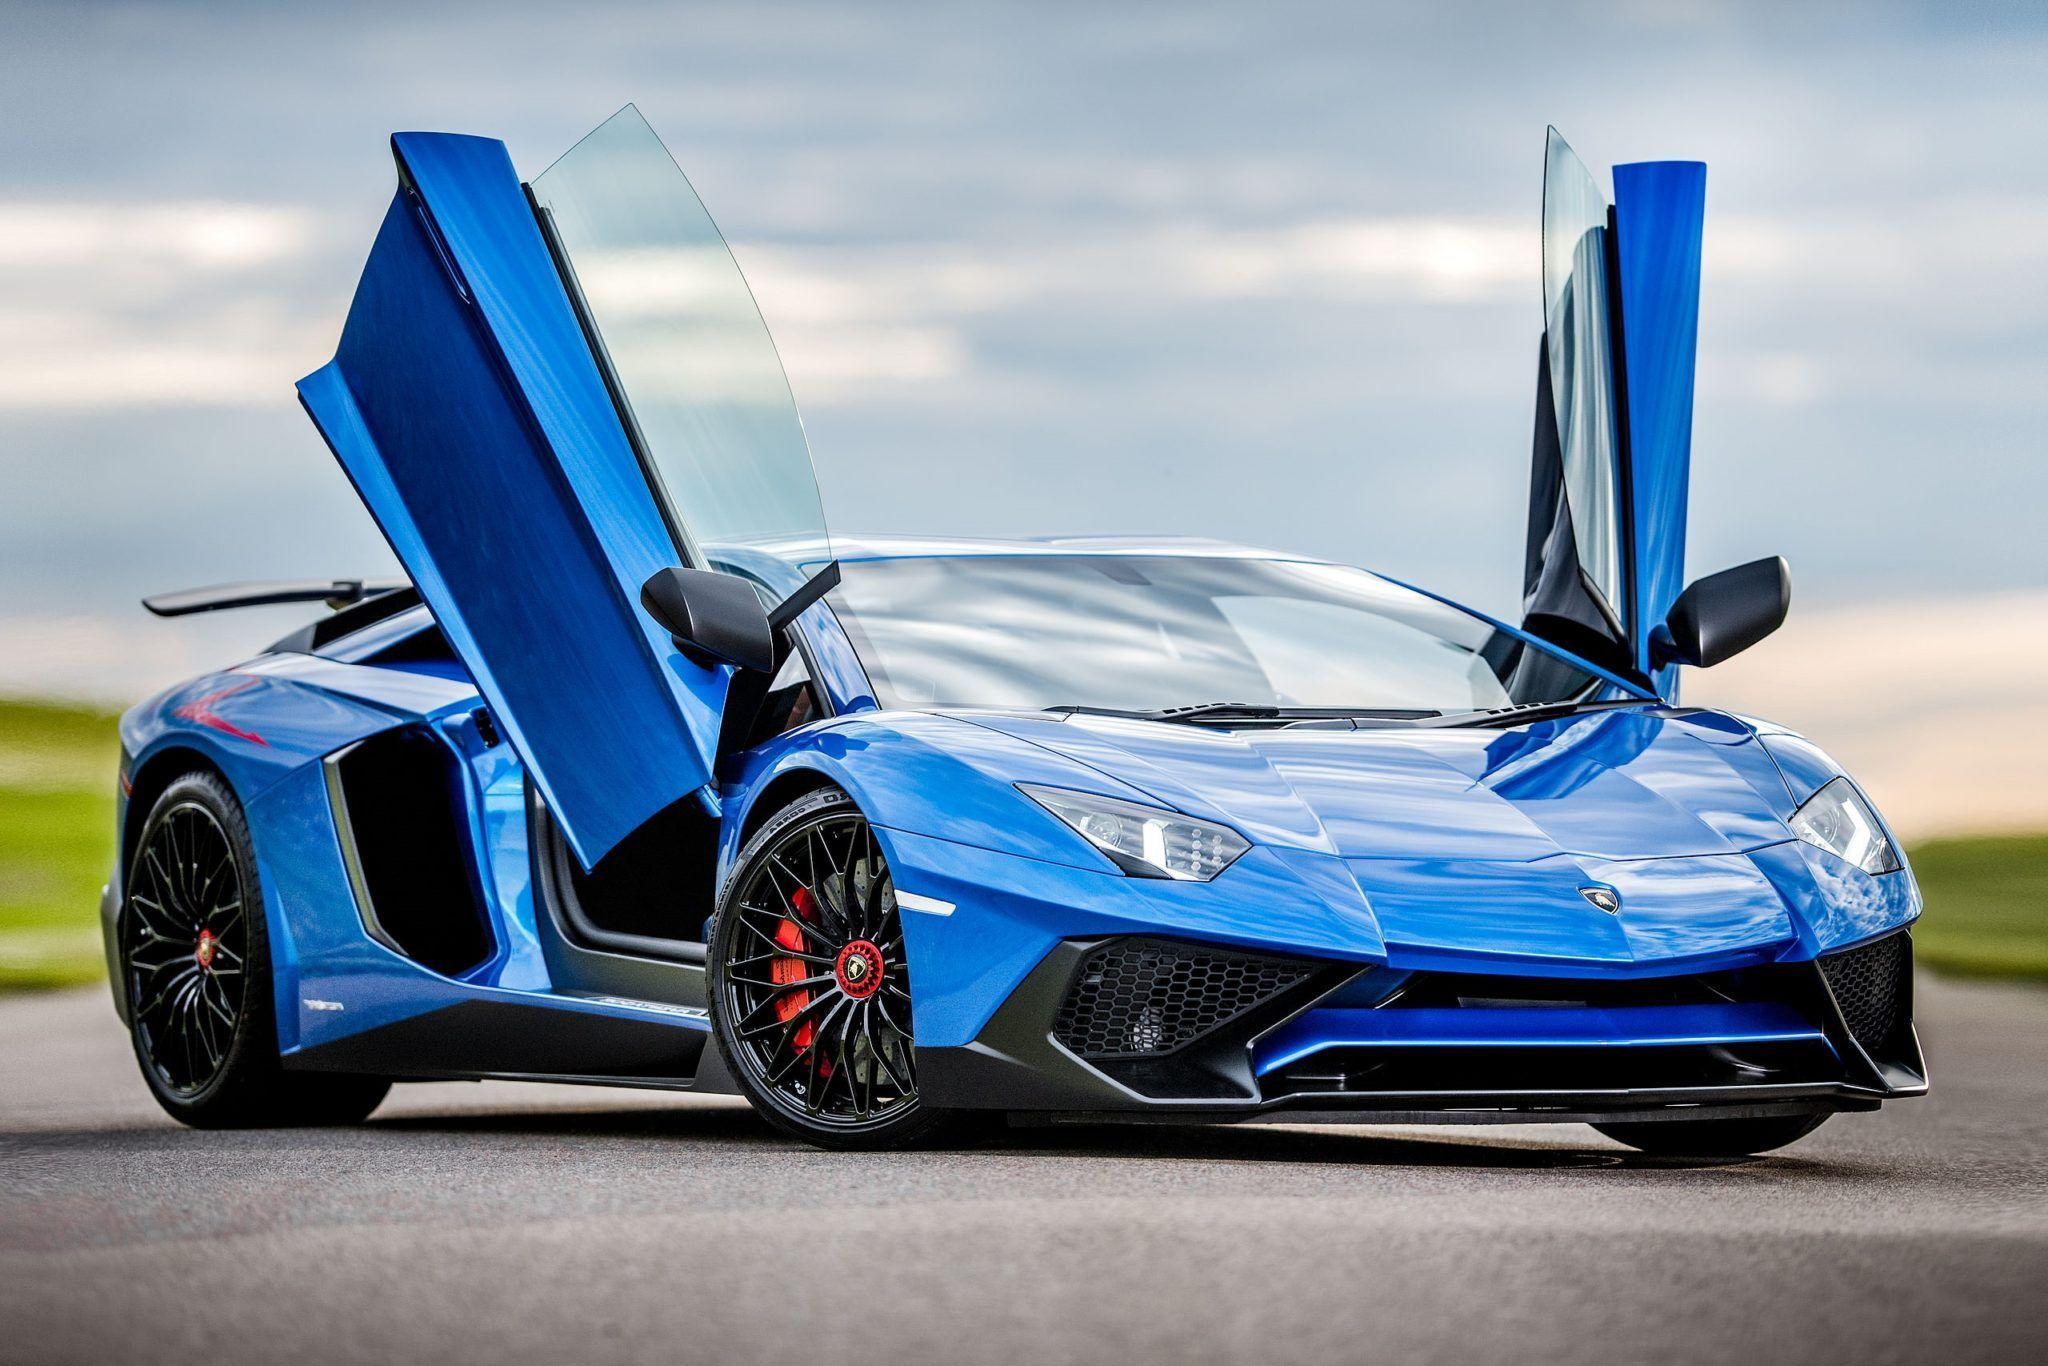 supercar rental in dubai in 2020 Super cars, Best luxury